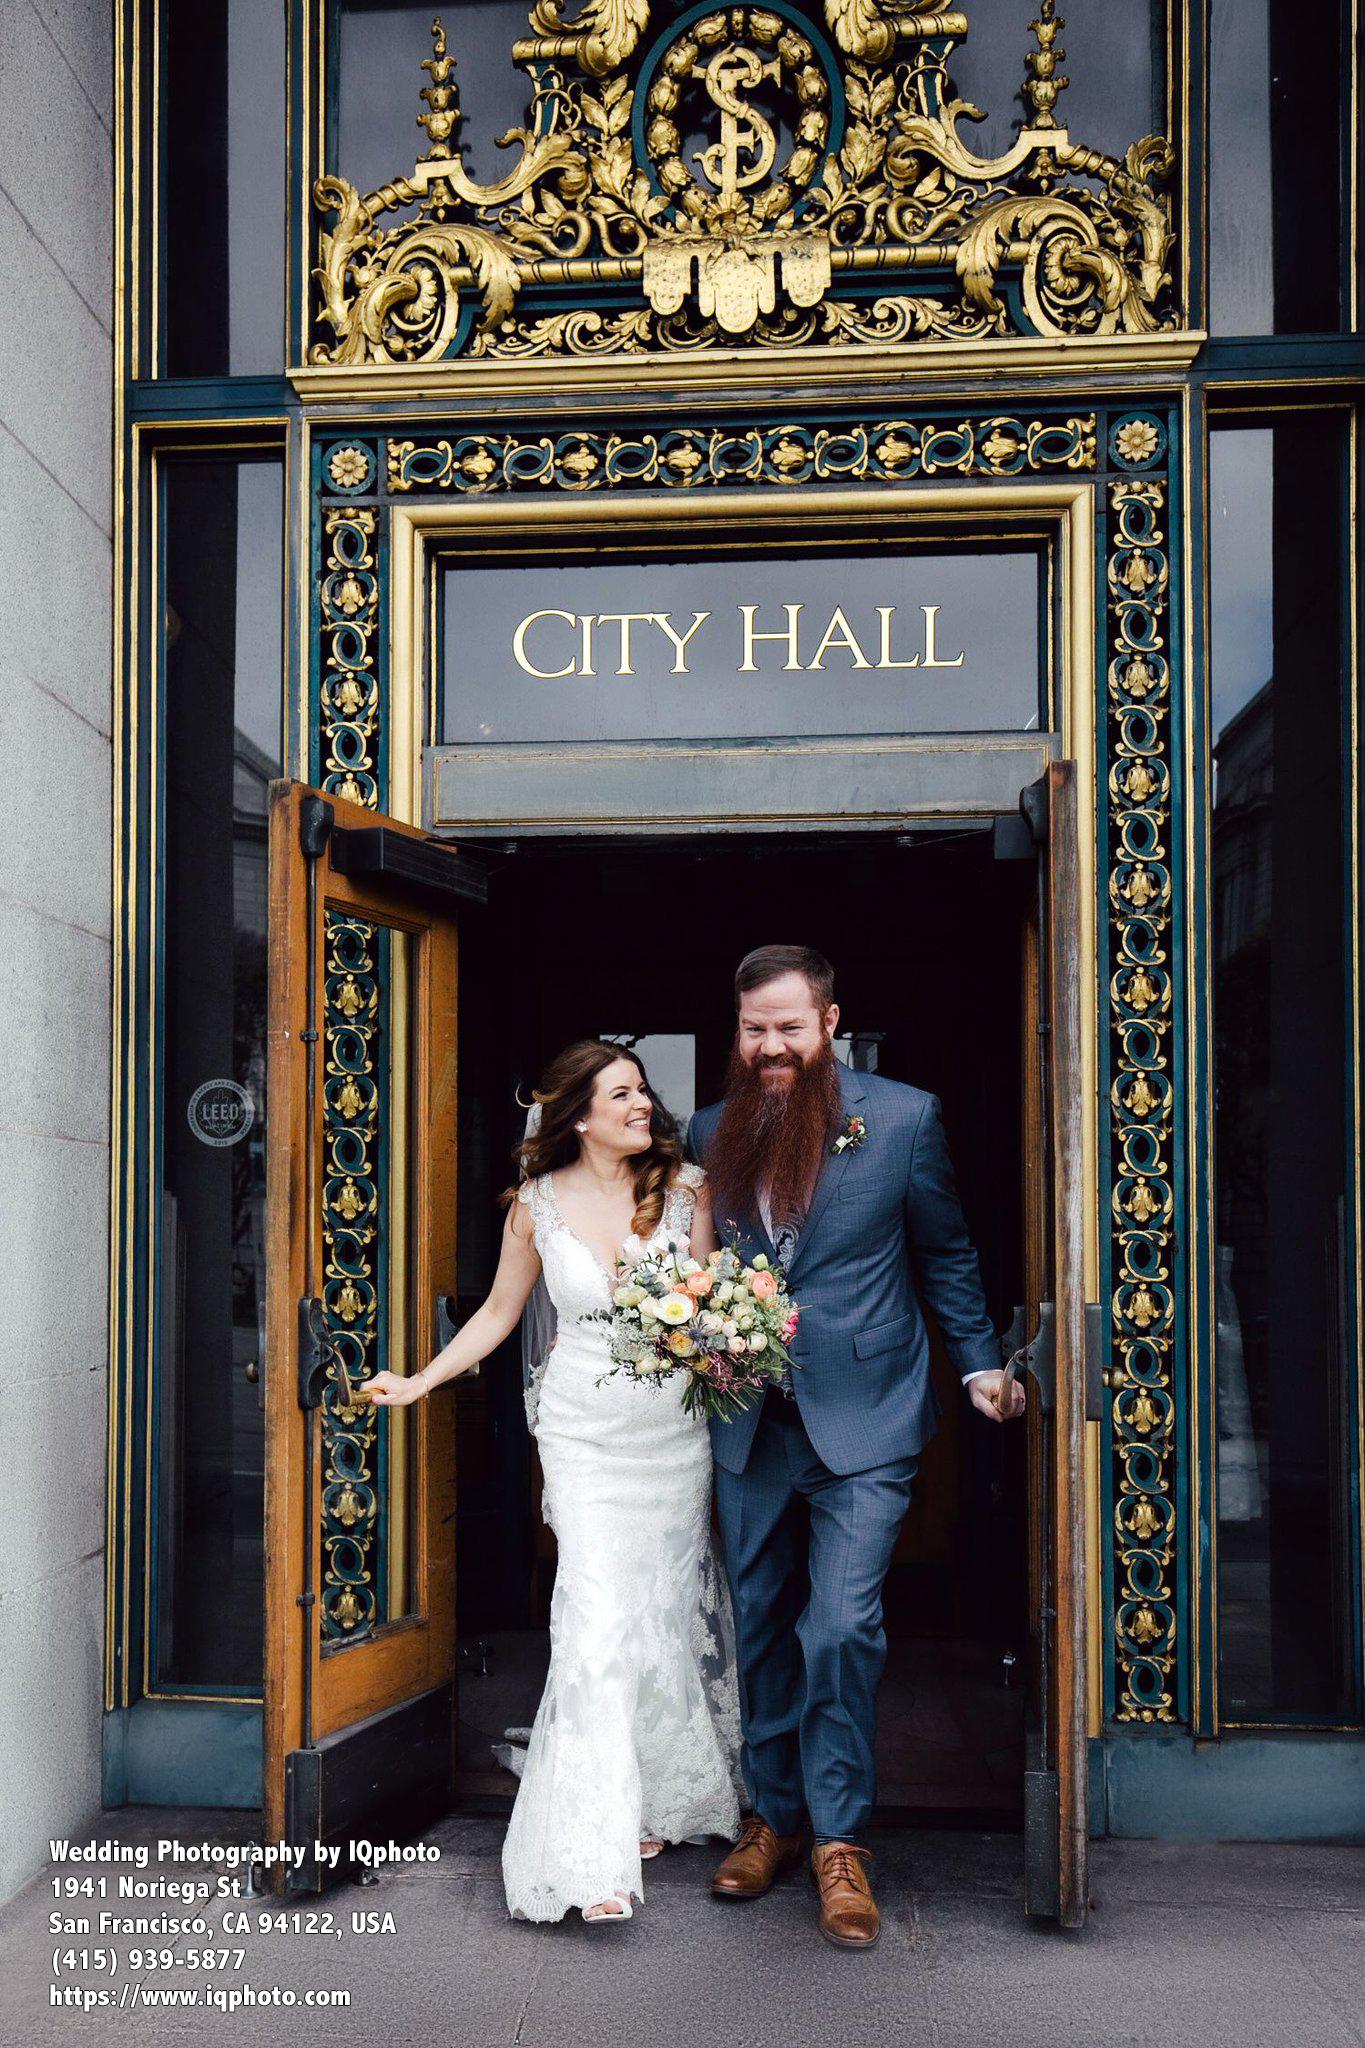 San Francisco City Hall Wedding Photography Videography